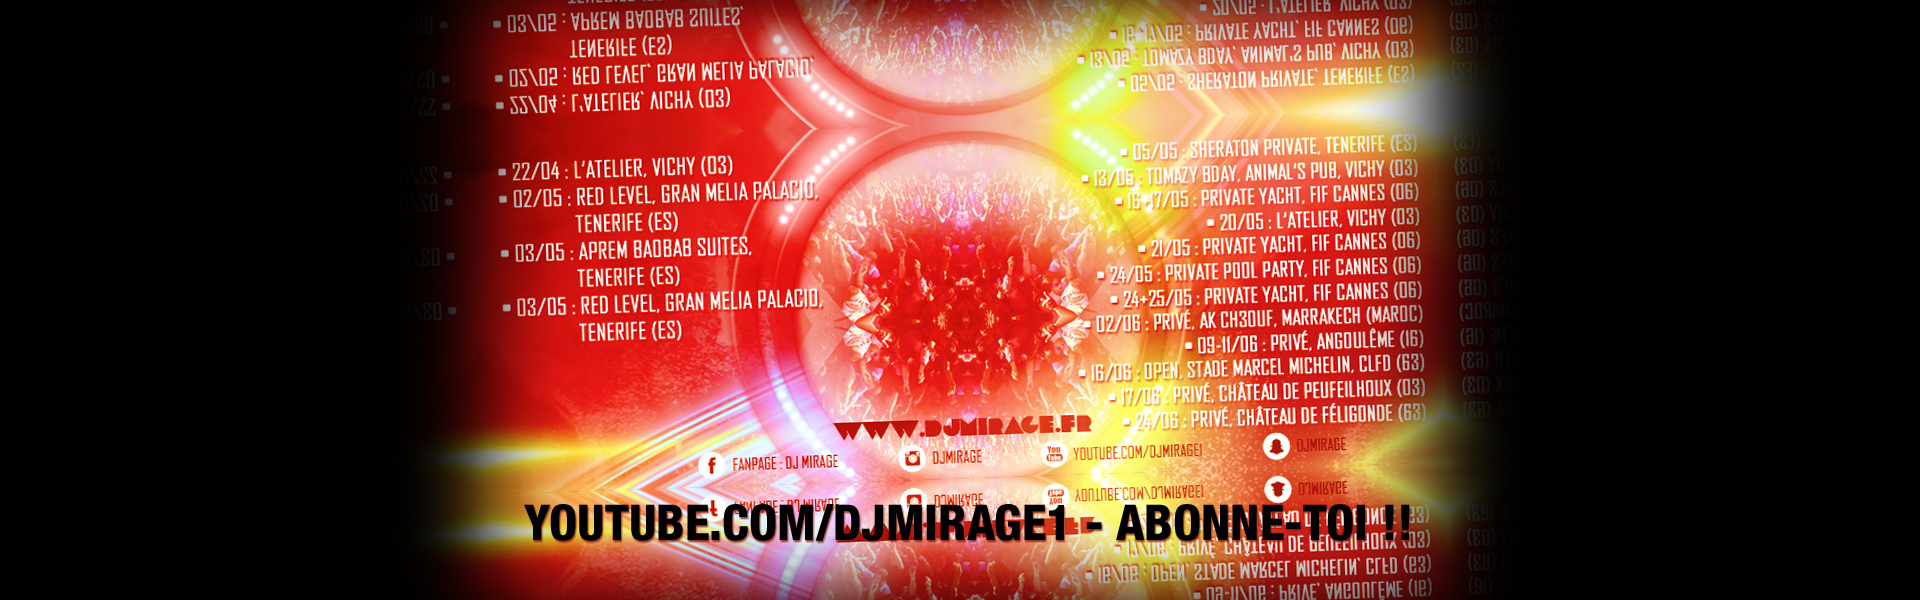 http://djmirage.fr/wp-content/uploads/2016/10/slider-accueil-deejaymirage-maijuin2017.jpg